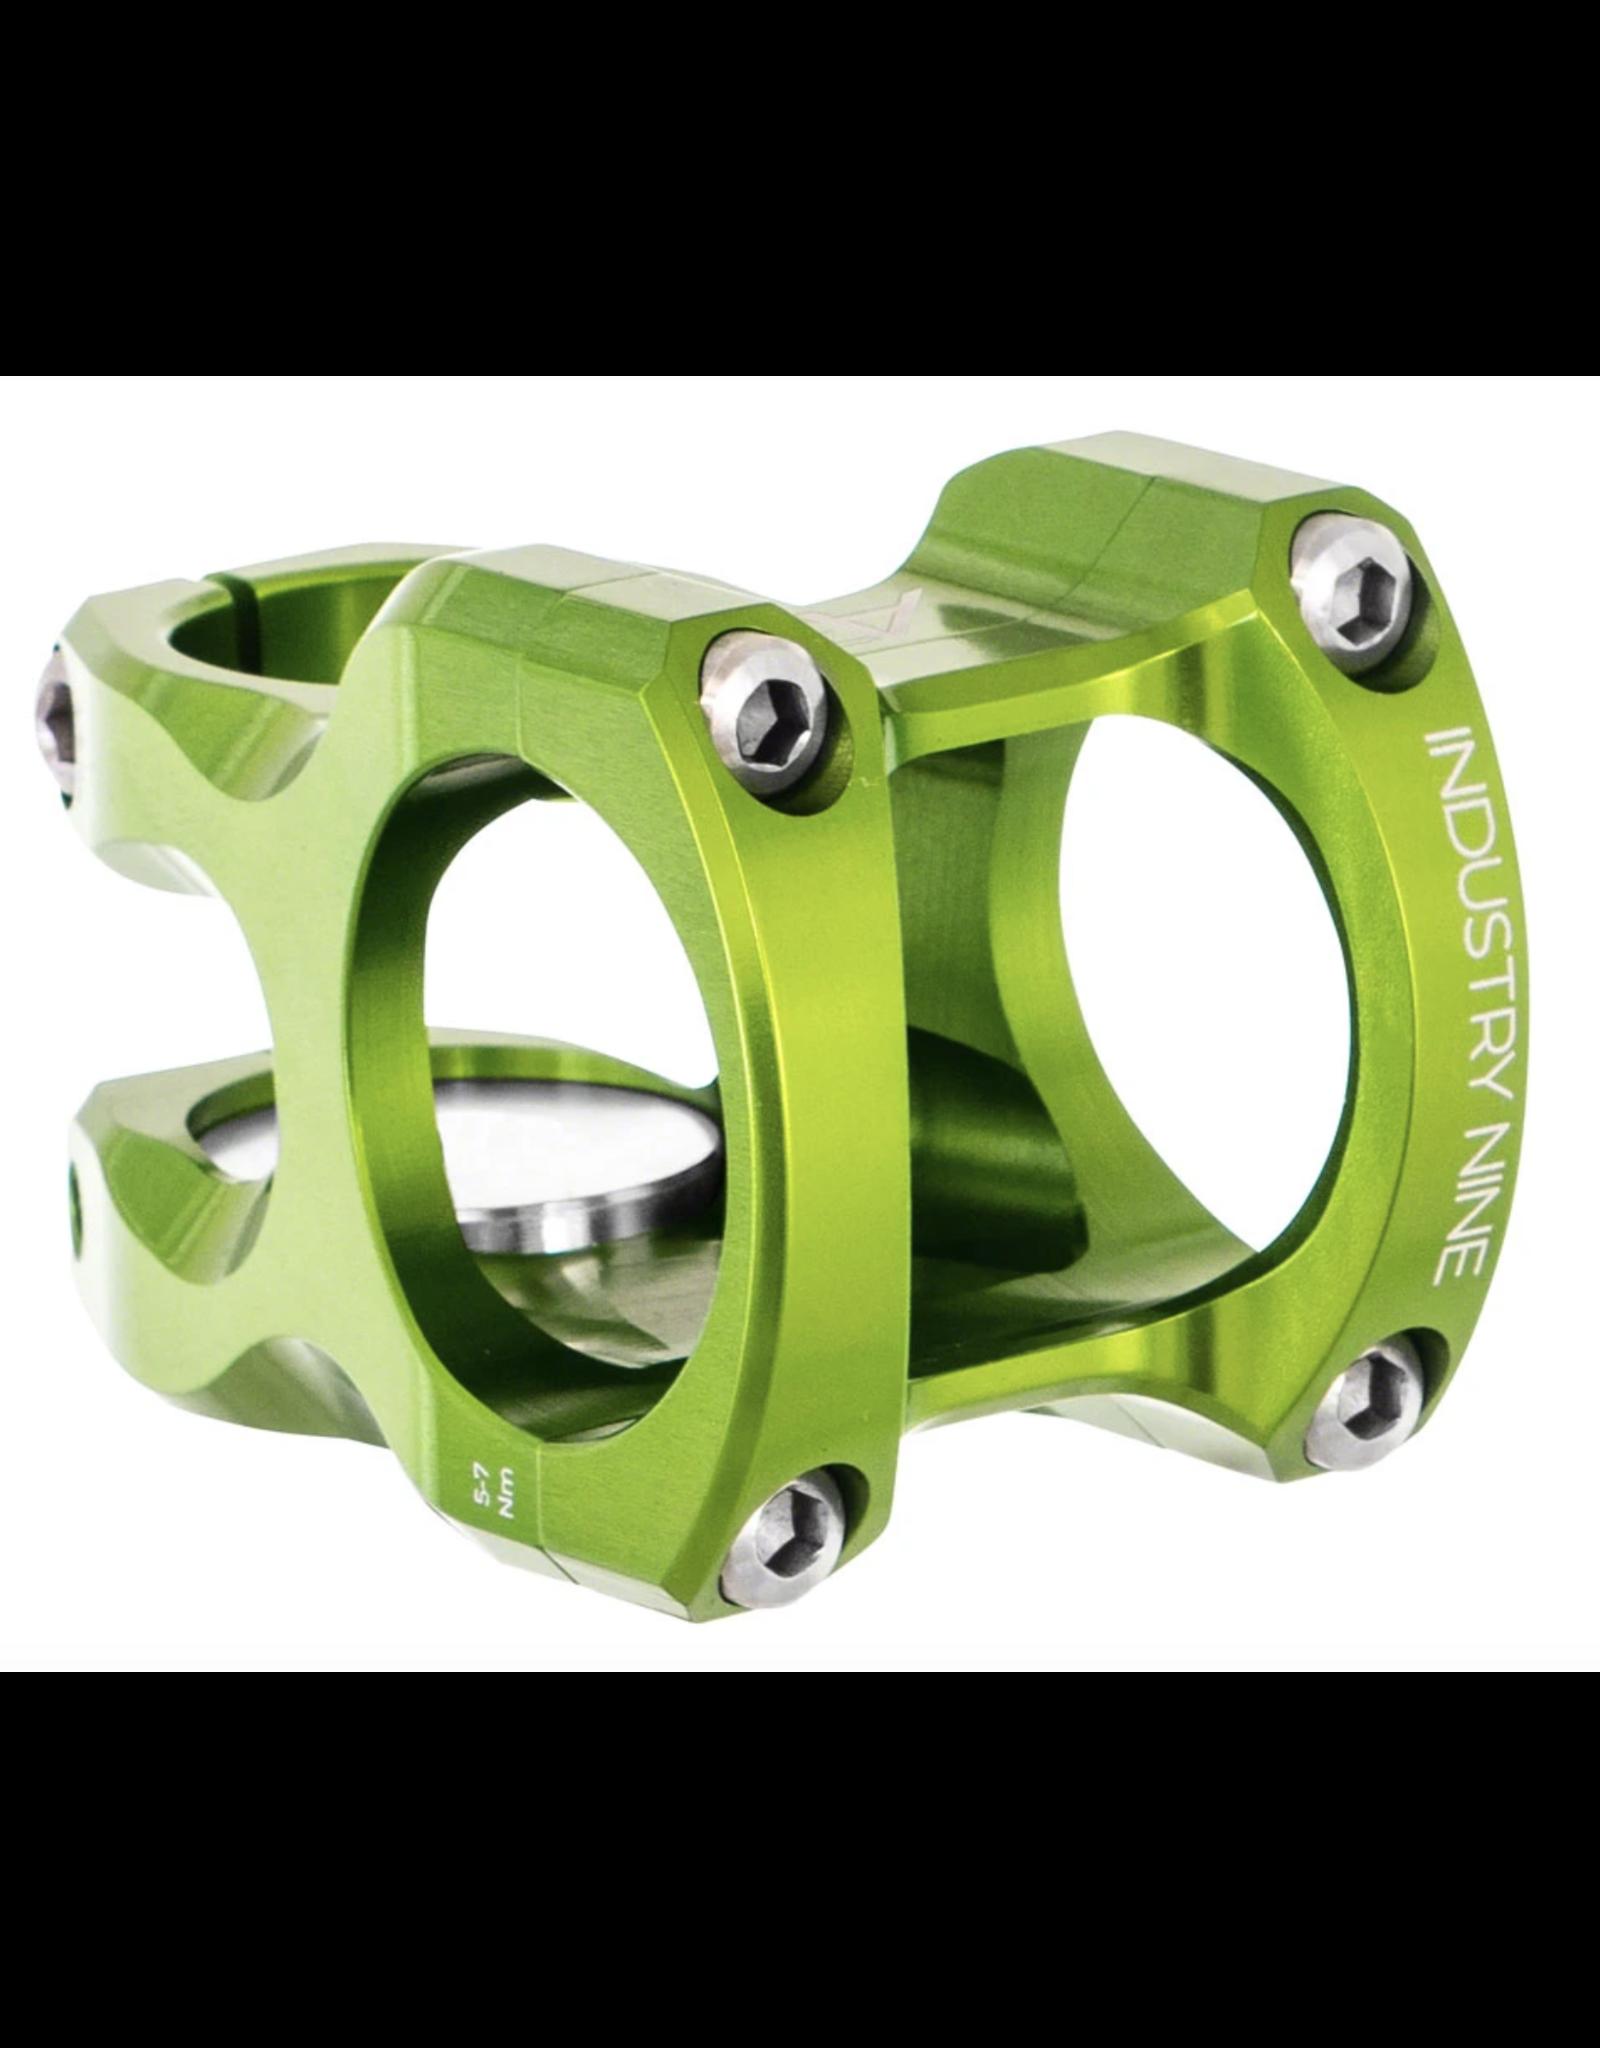 "Industry Nine Industry Nine A35 Stem - 32mm, 35 Clamp, +/-9, 1 1/8"", Aluminum, Lime"